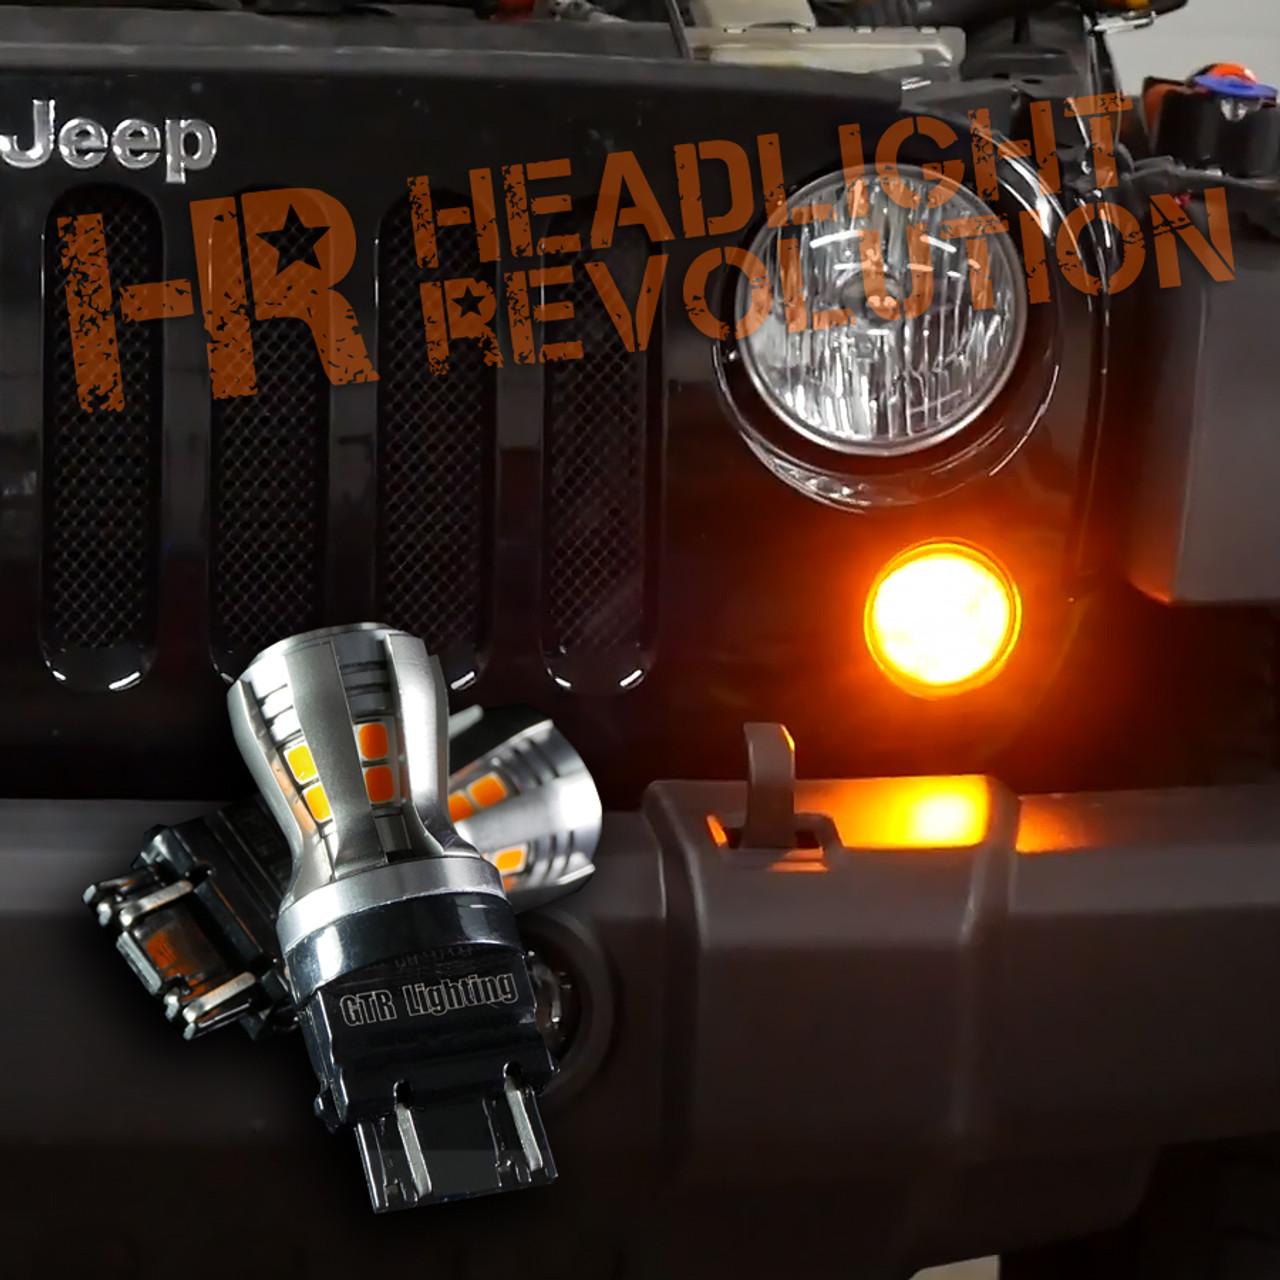 2007 2017 jeep jk front turn signal led upgrade kit [ 900 x 900 Pixel ]